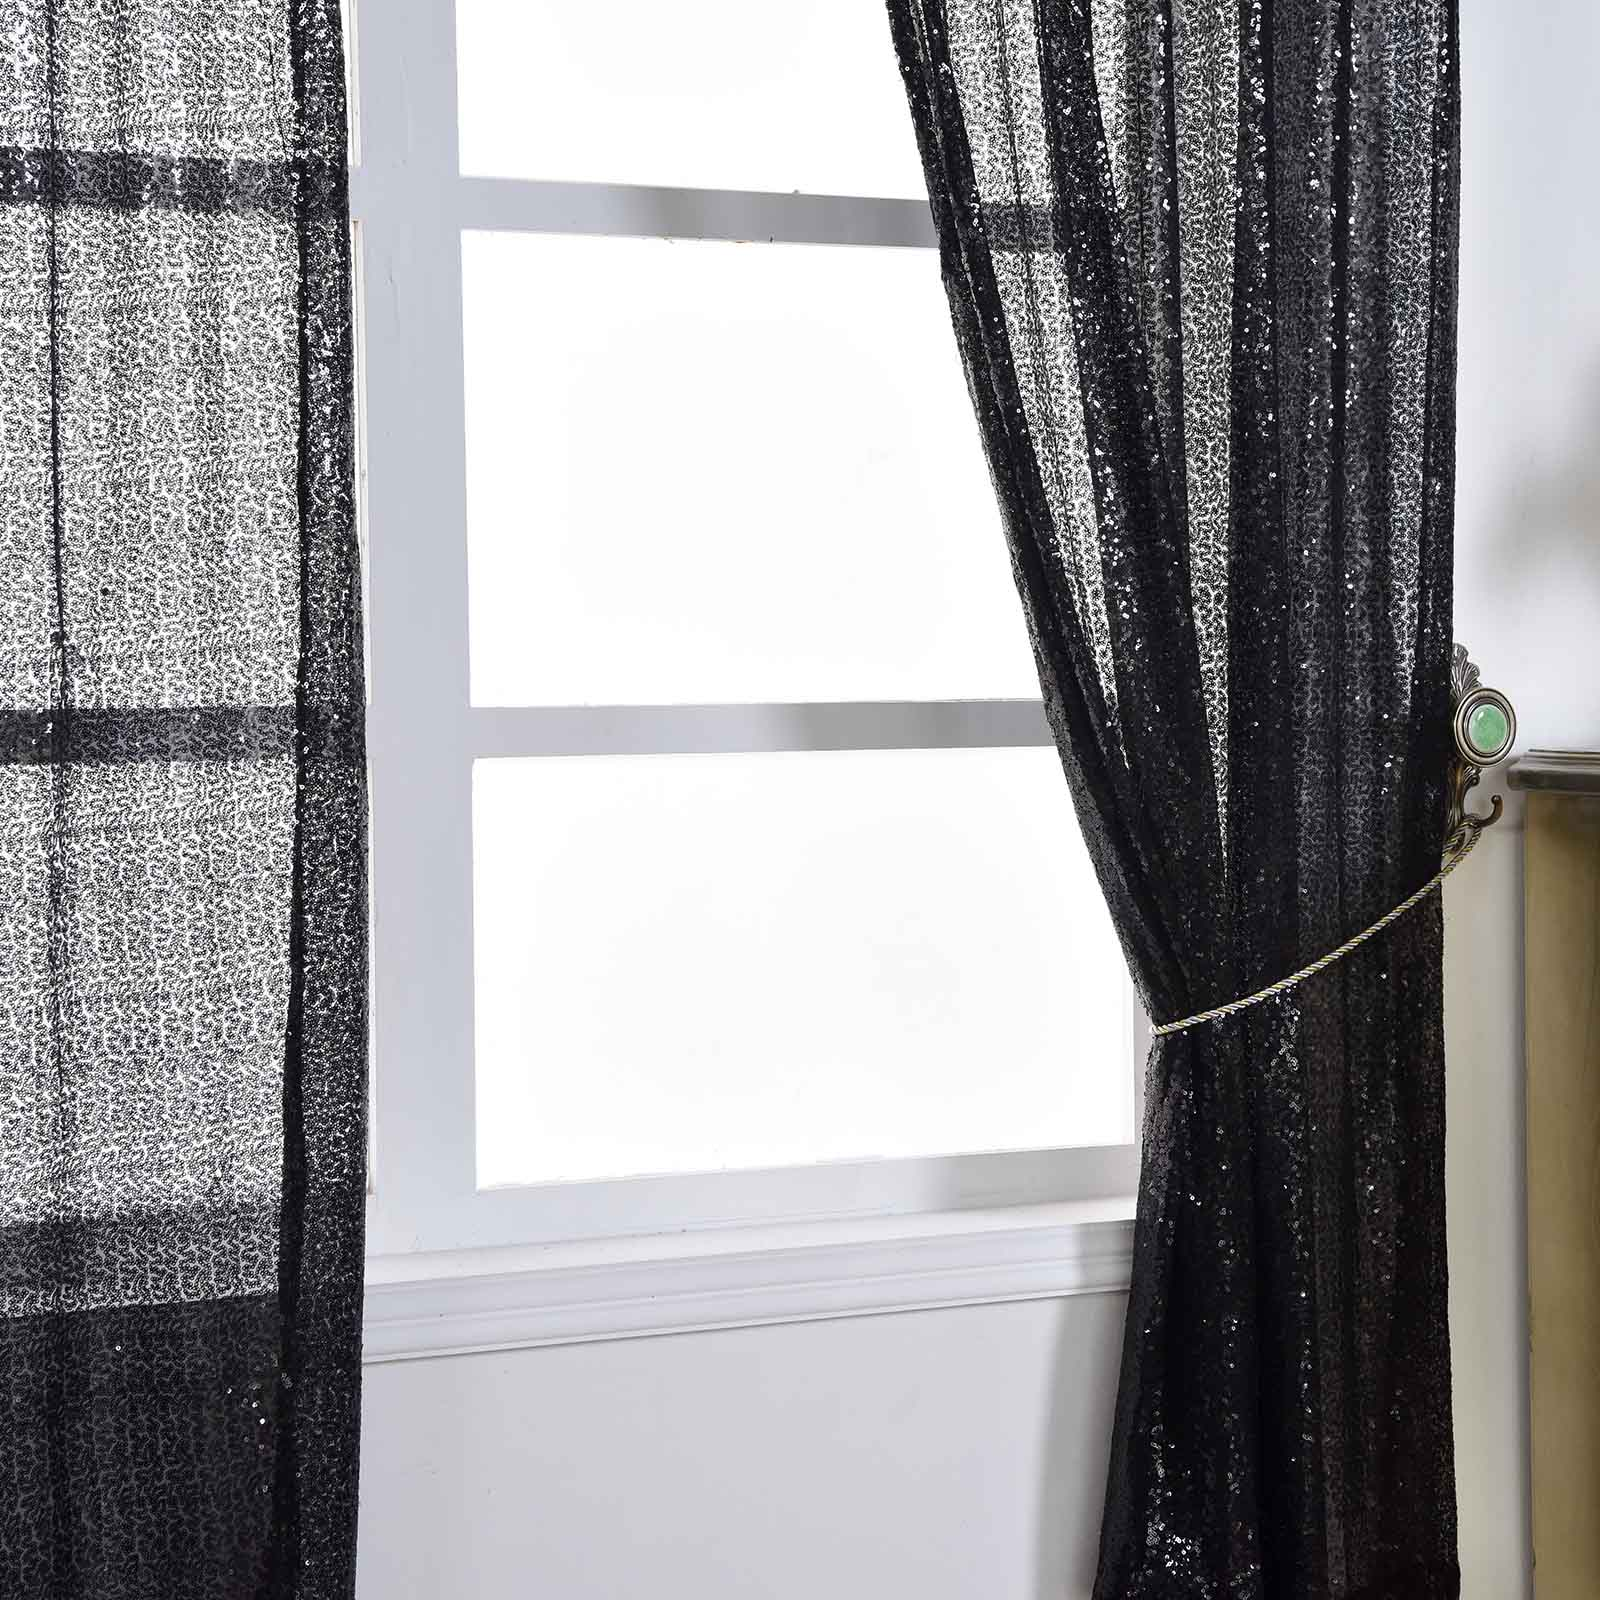 4-pcs-52-034-x-84-034-Sequined-Window-Curtains-Drapes-Panels-Backdrop-Home-Party-Decor thumbnail 6